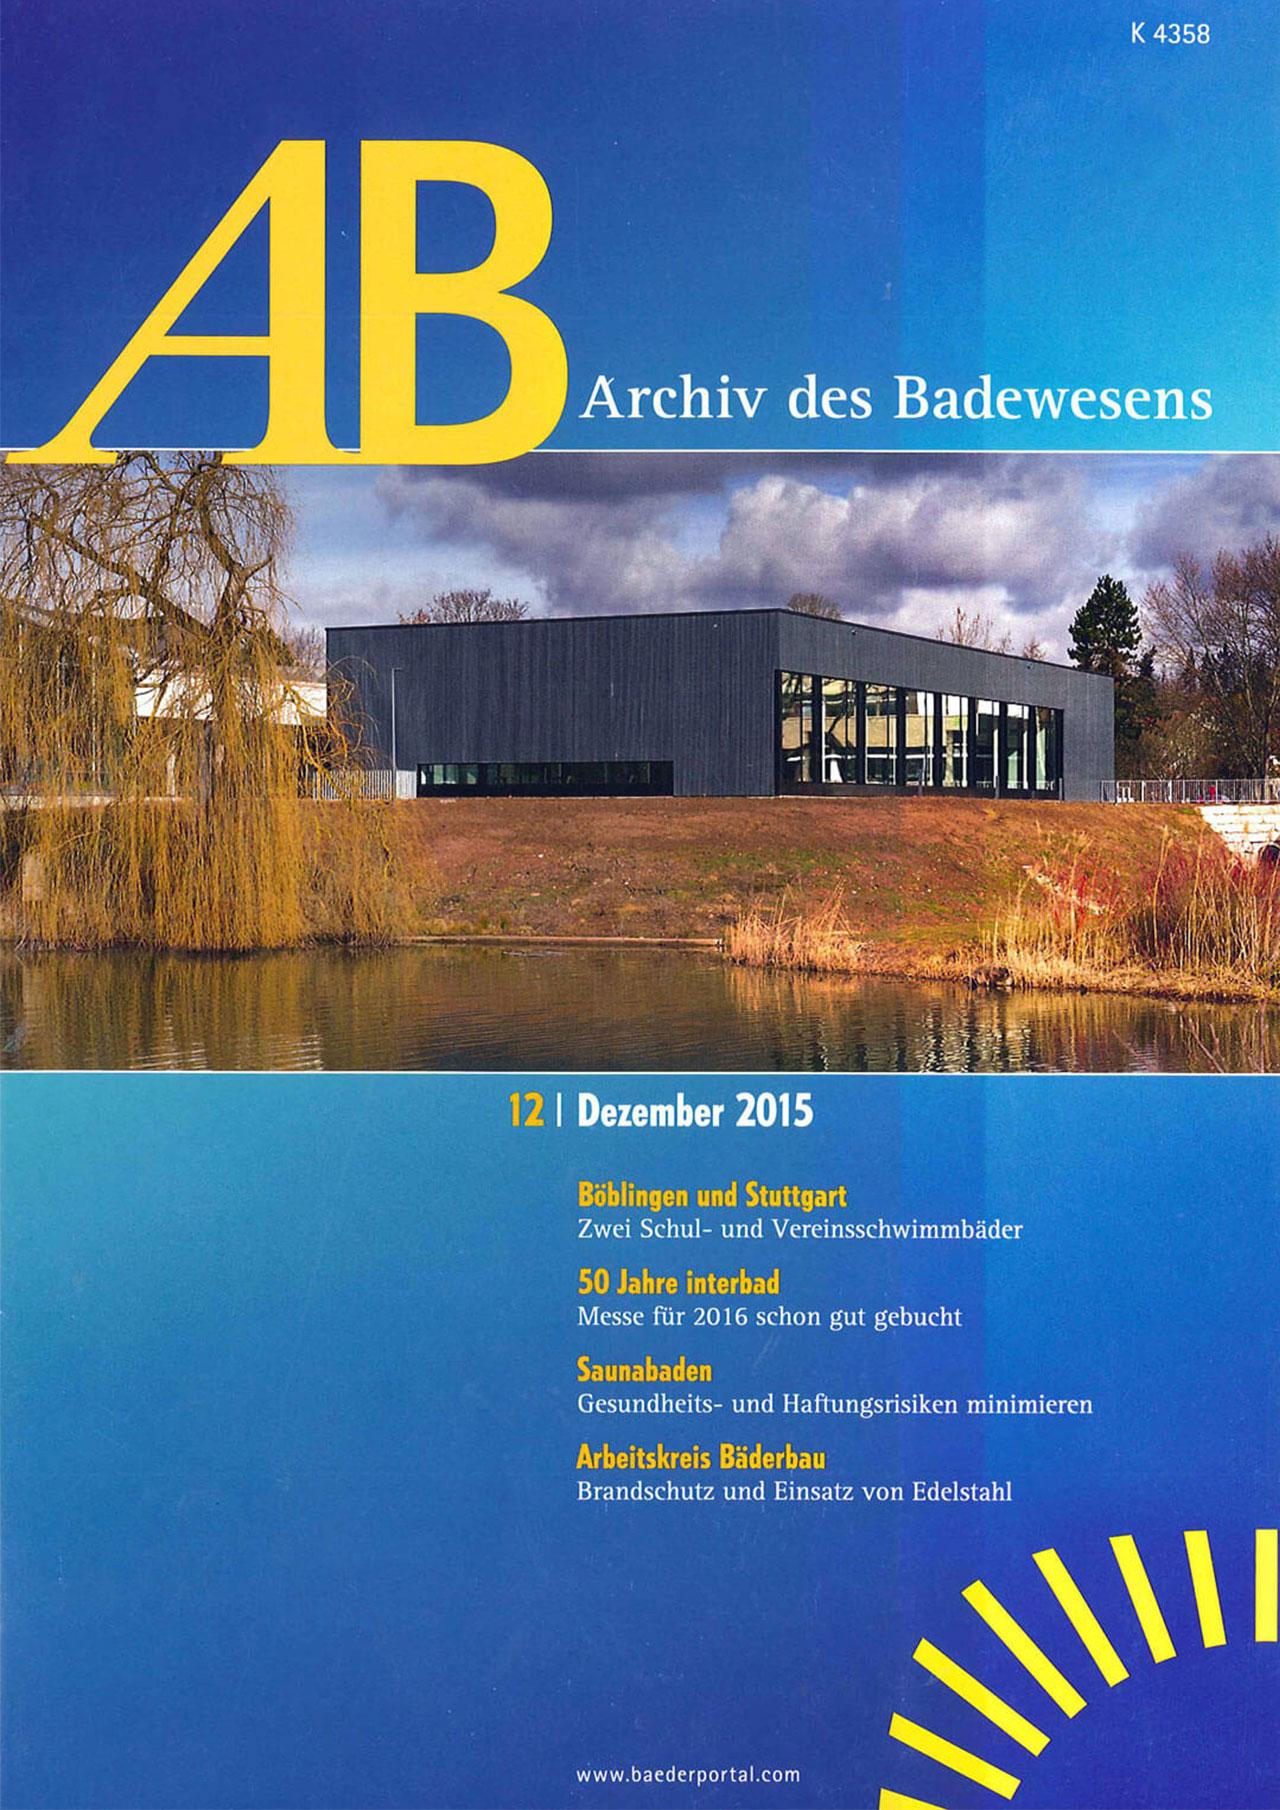 Archiv des Badewesens